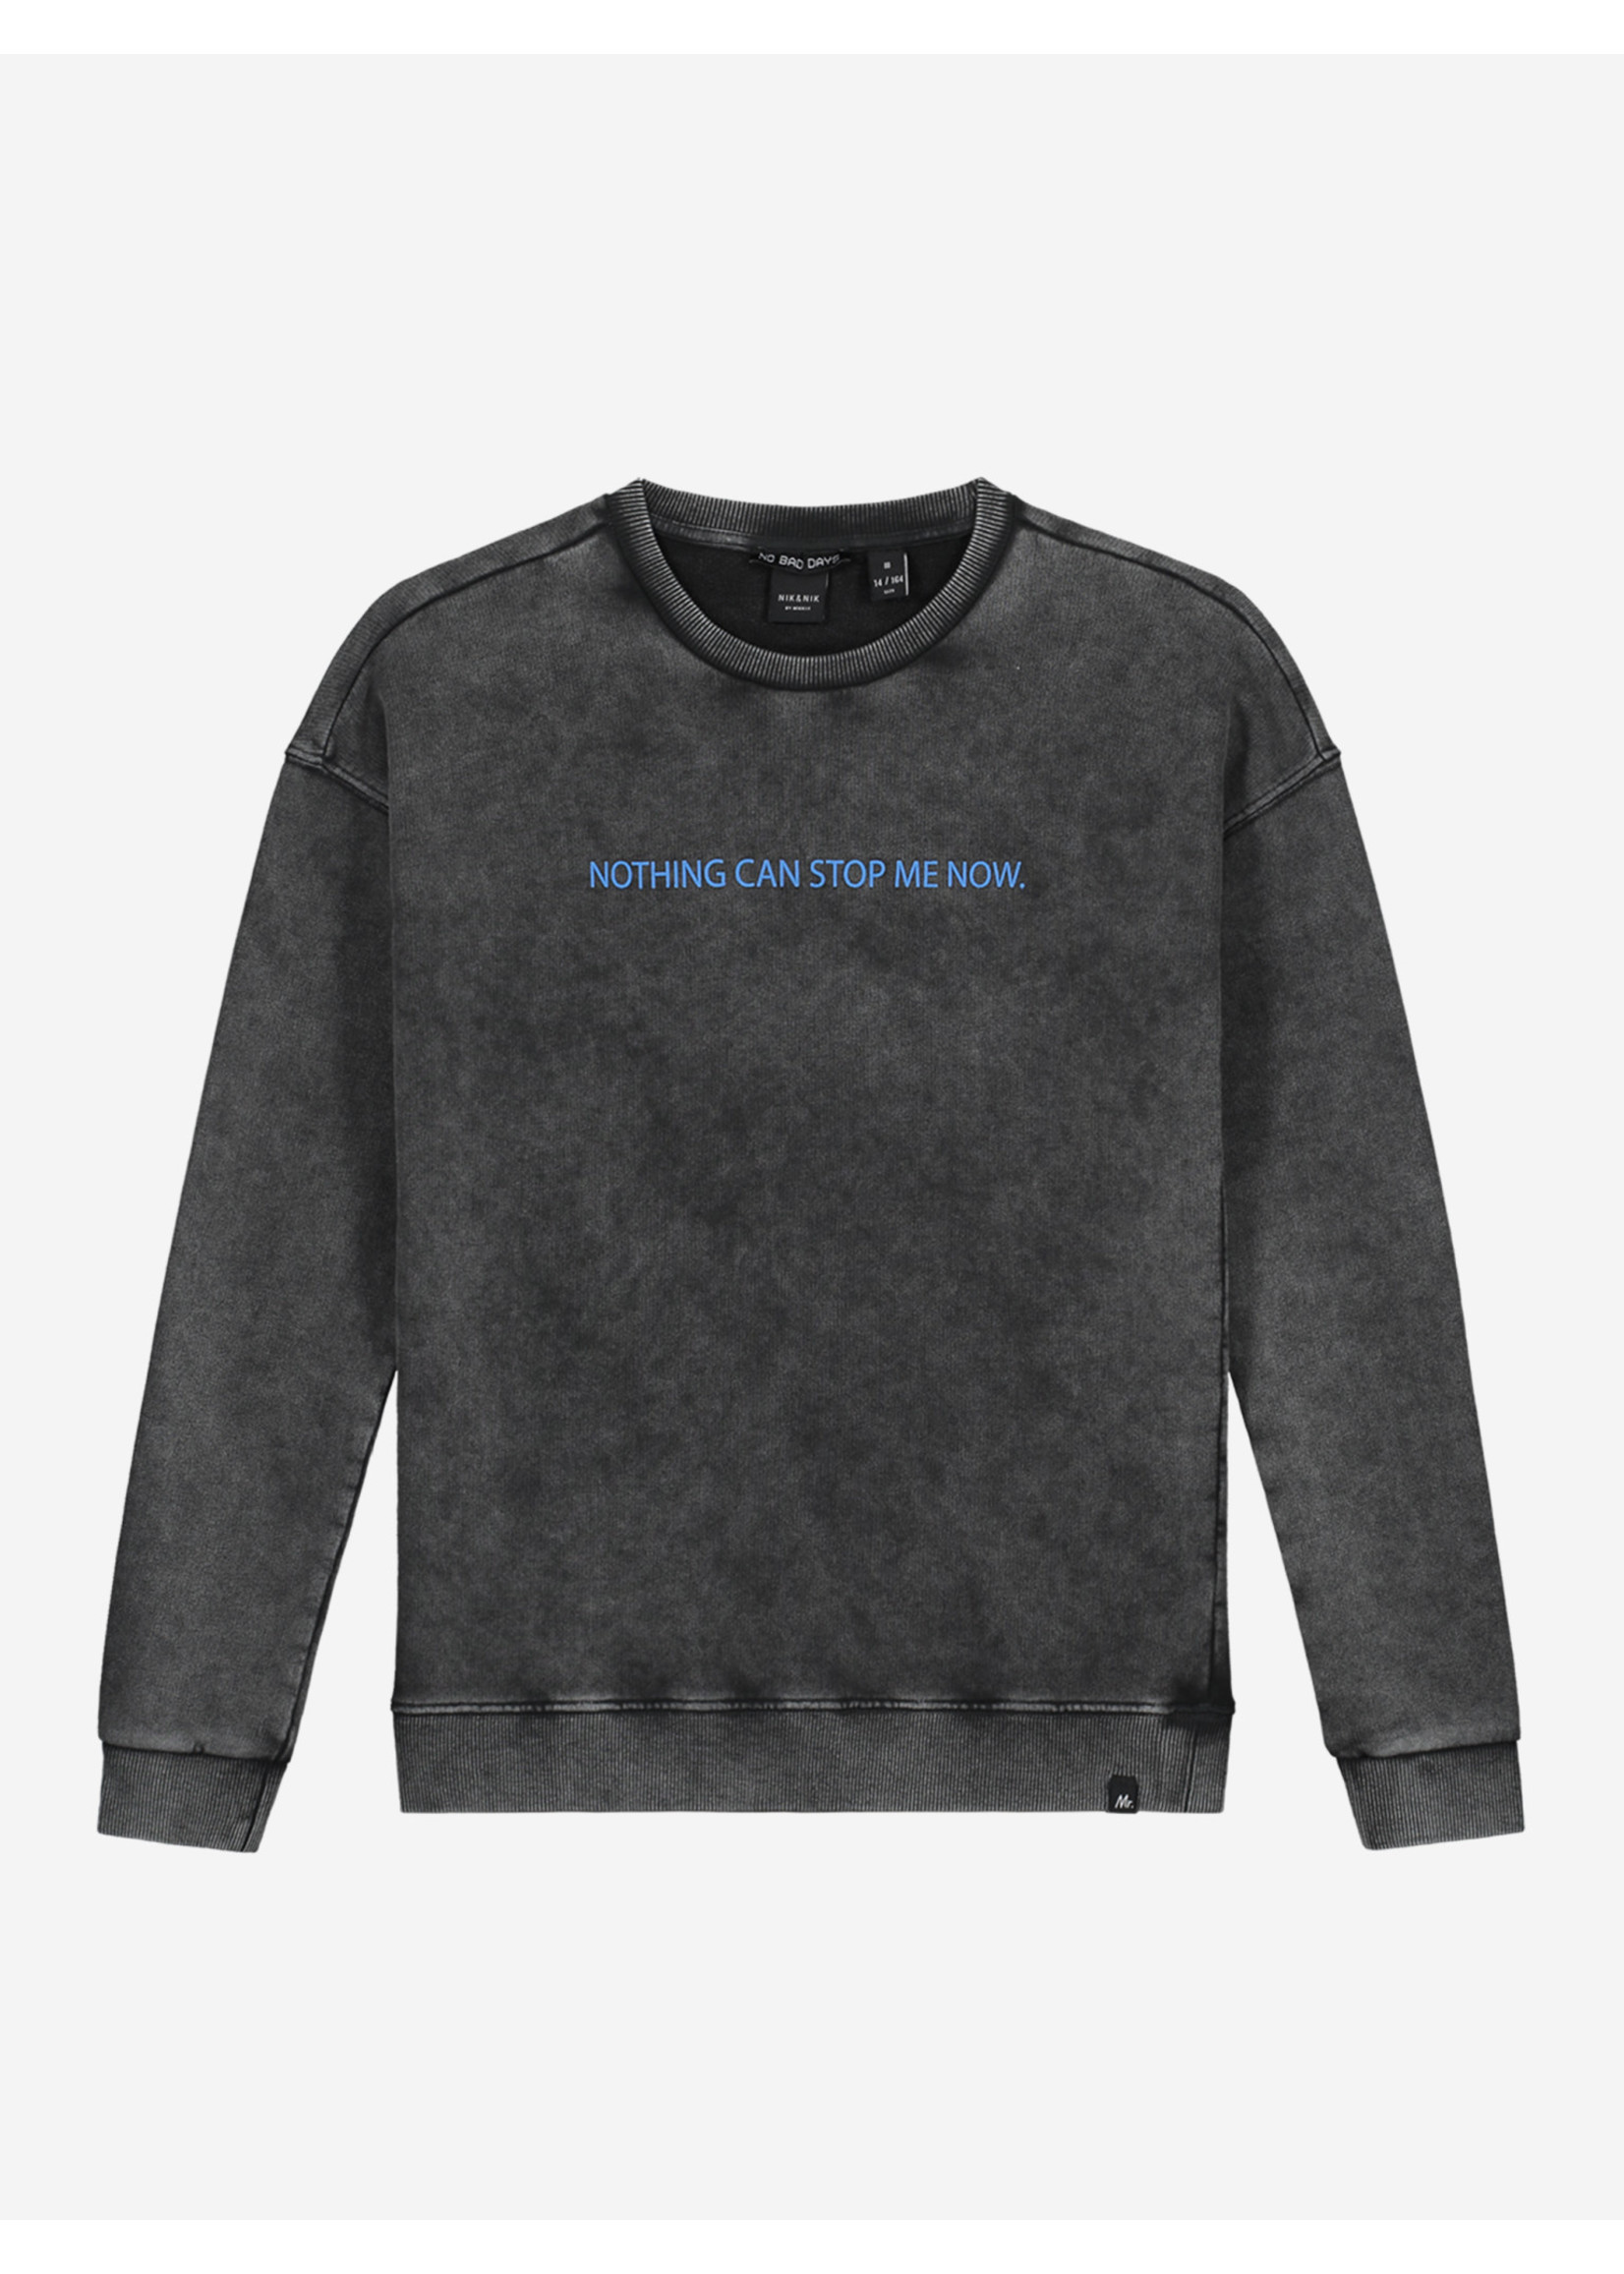 NIK&NIK NIK&NIK Dexter Sweater - Black